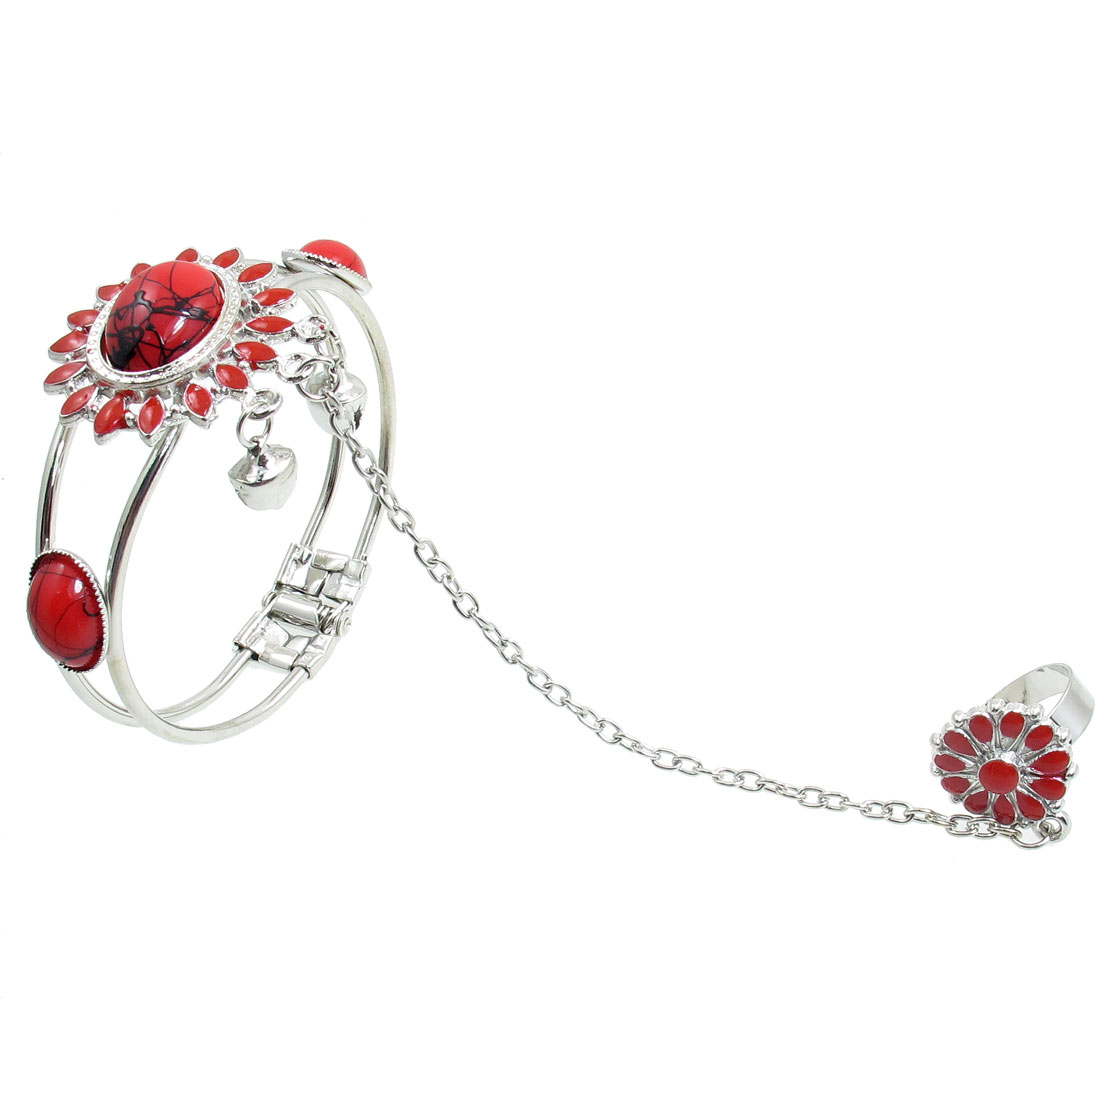 Oval Red Plastic Beads Metal Chain Finger Ring Bracelet for Ladies